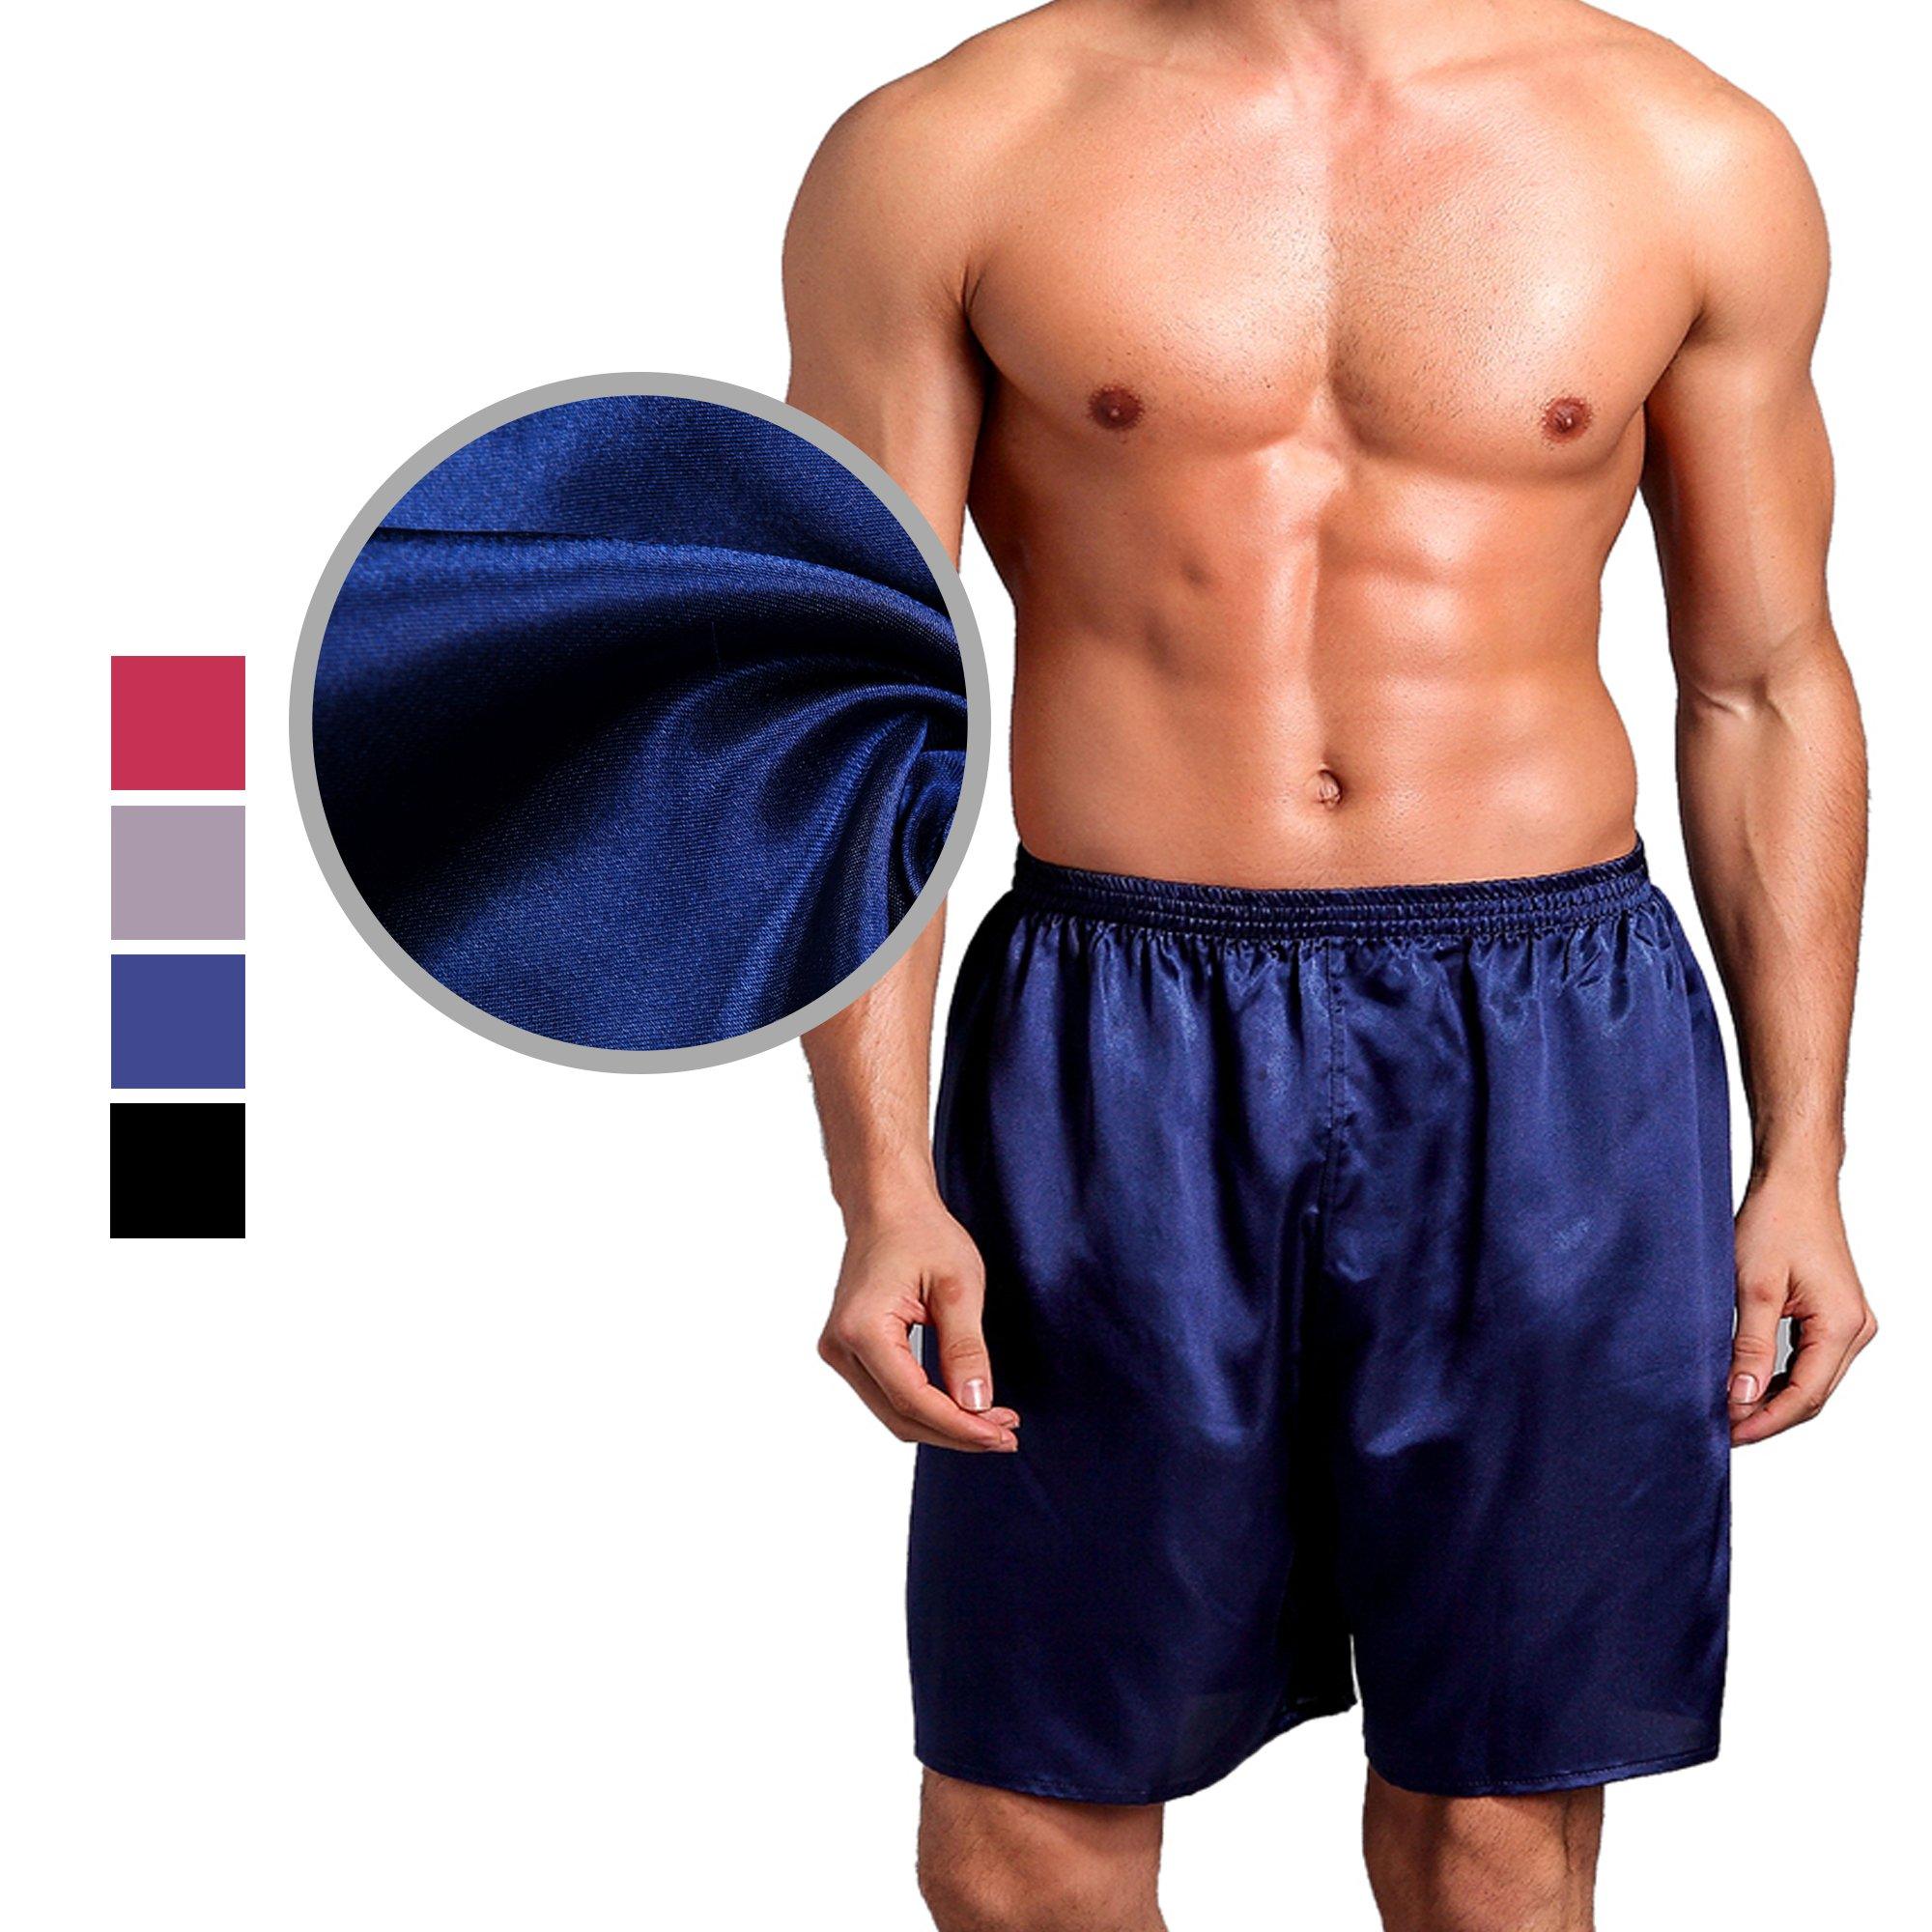 Chris&Je Mens Lounge Shorts Satin Fabric 28''-34'' Waist Size